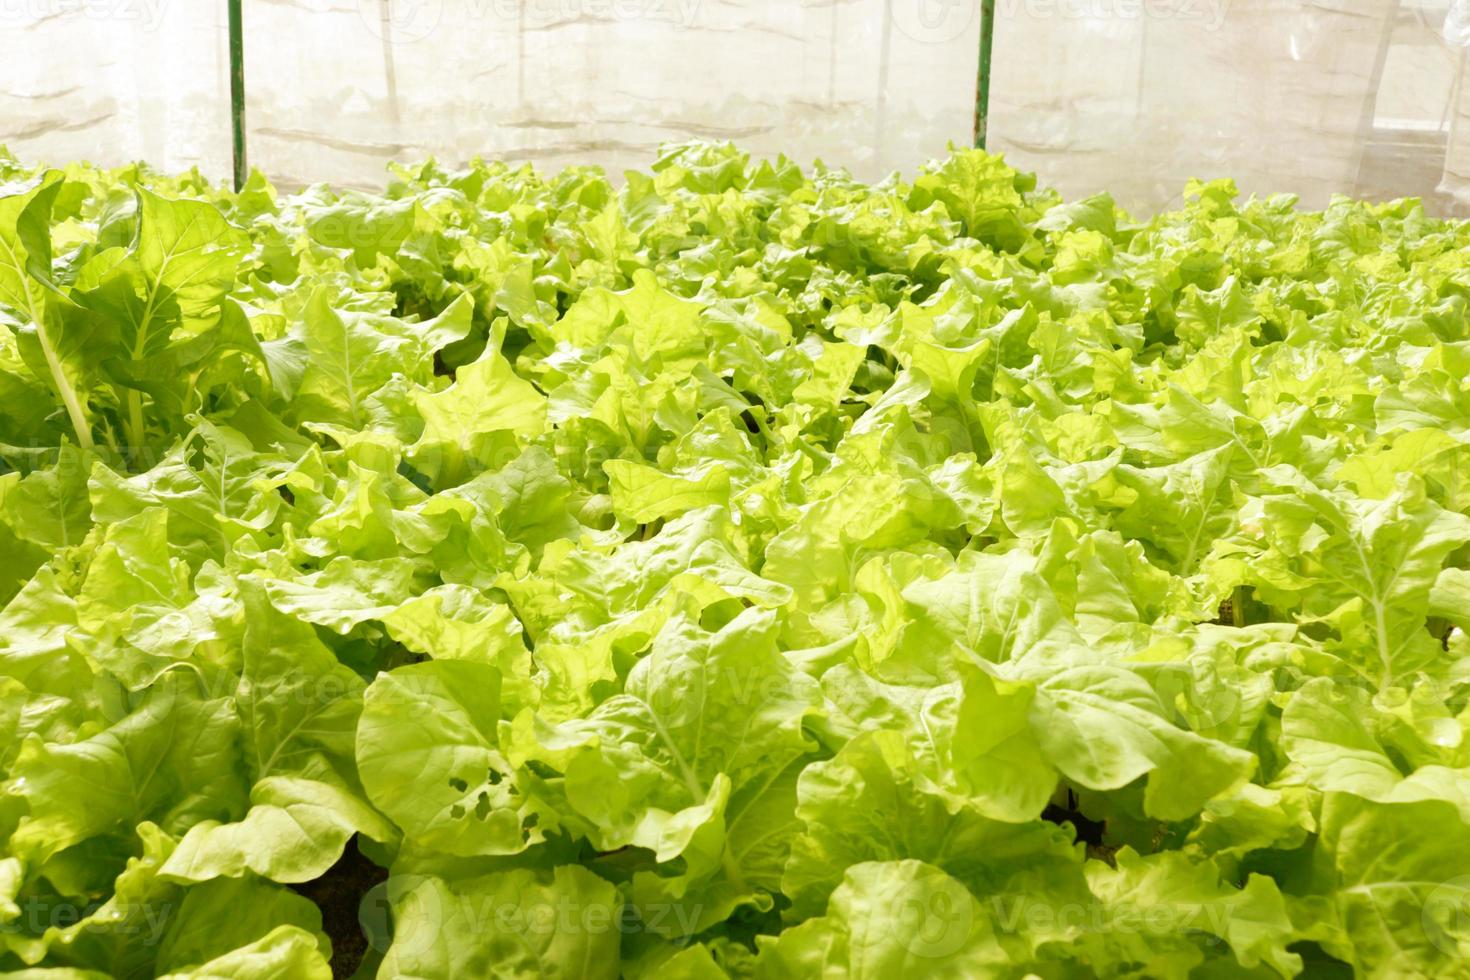 jordbruks foto